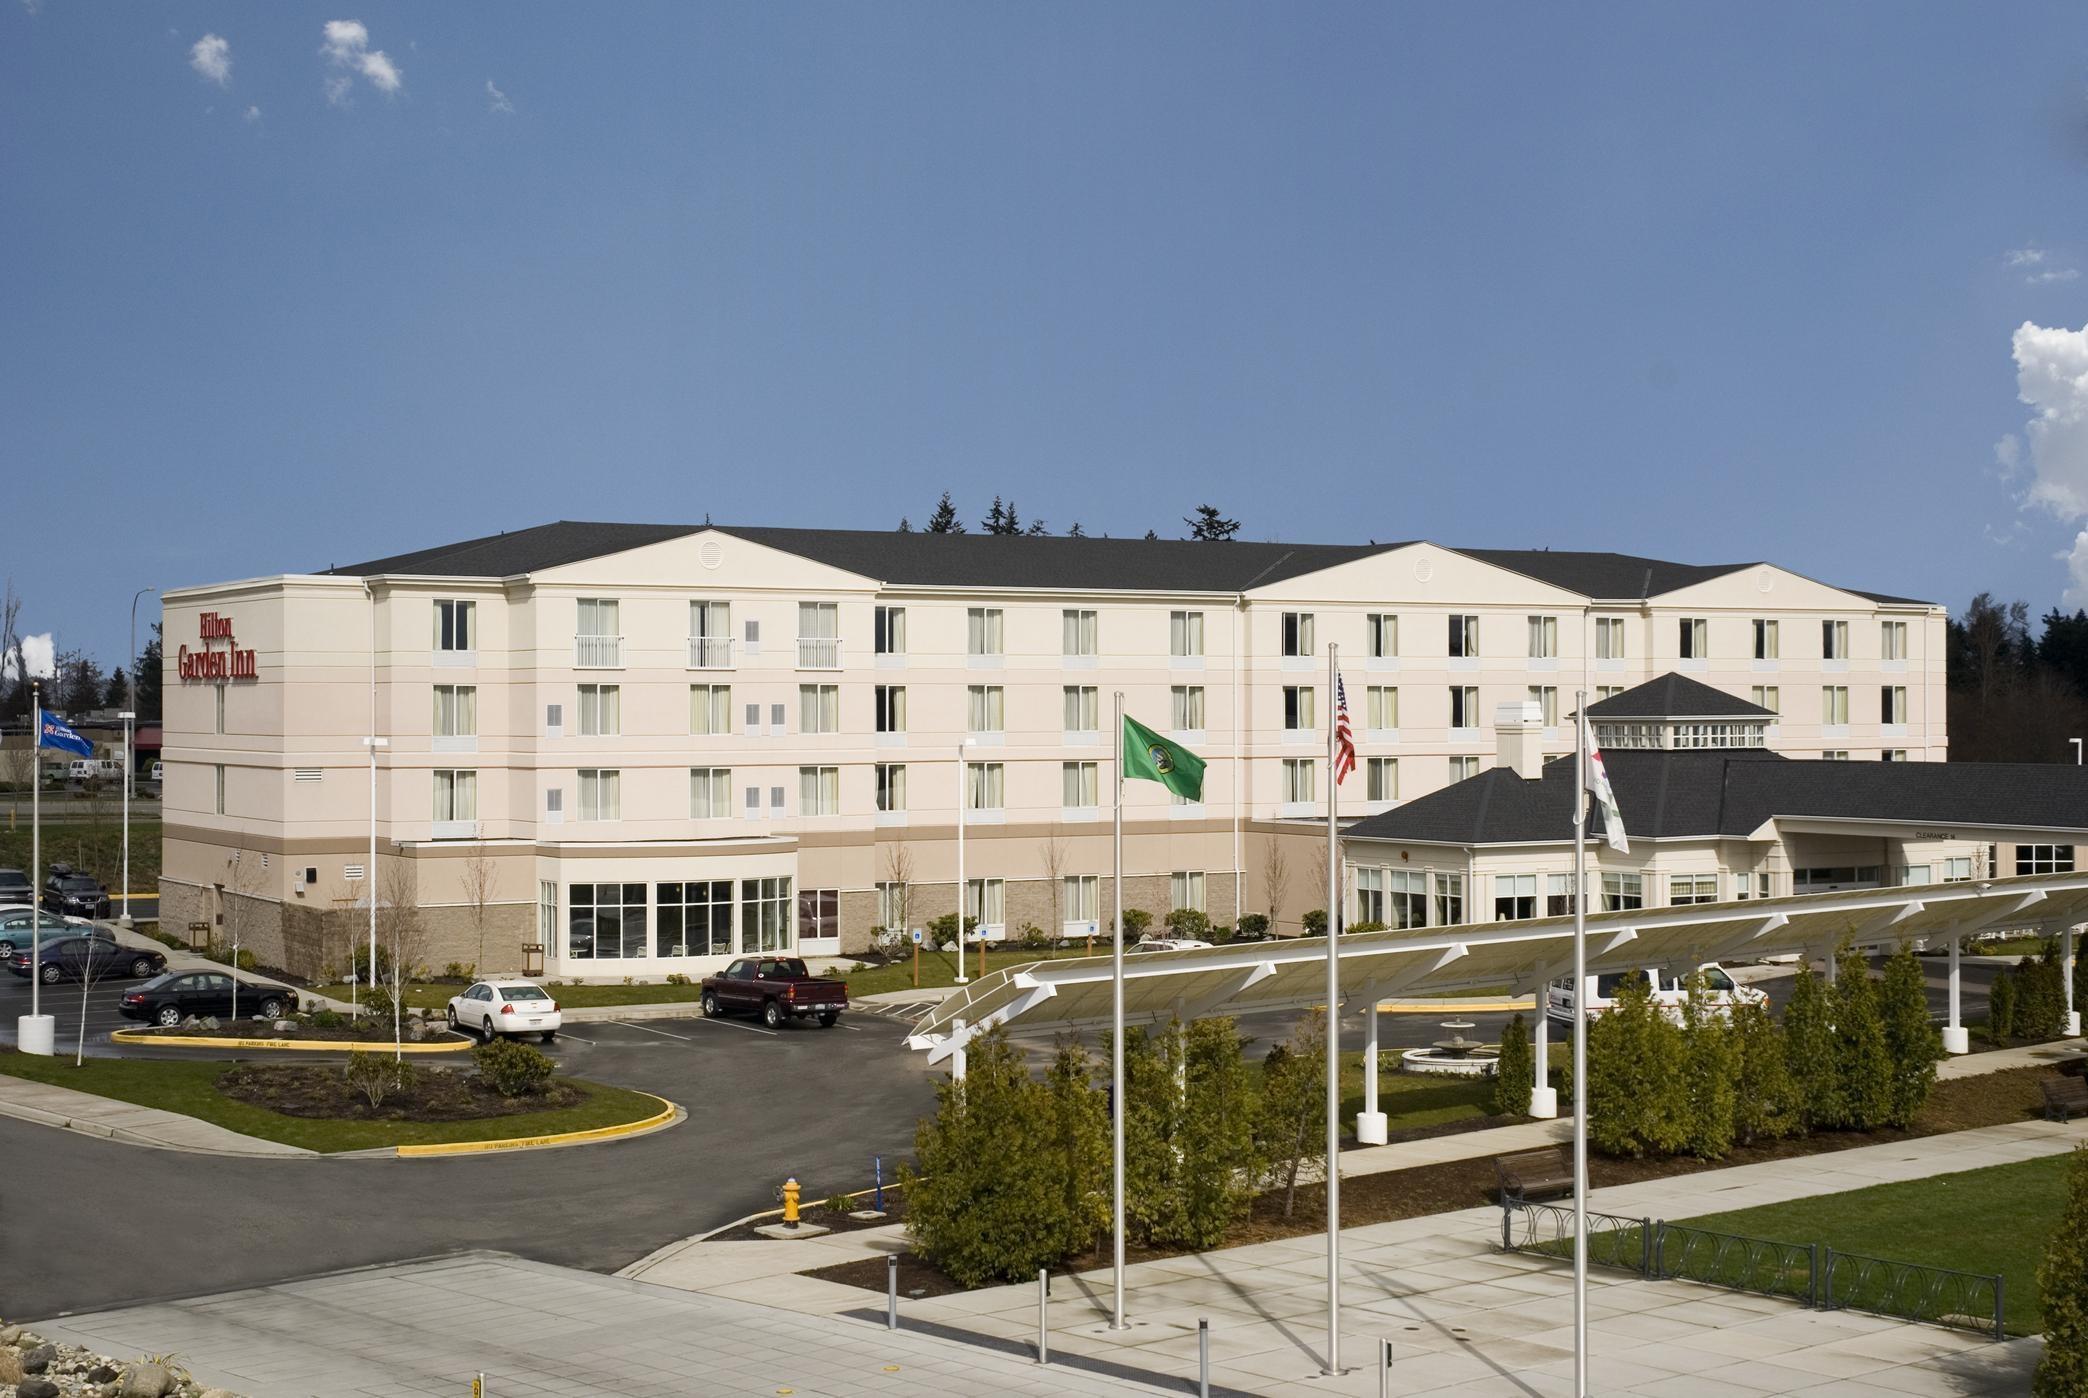 Hilton Garden Inn Seattle North Everett Coupons Mukilteo Wa Near Me 8coupons